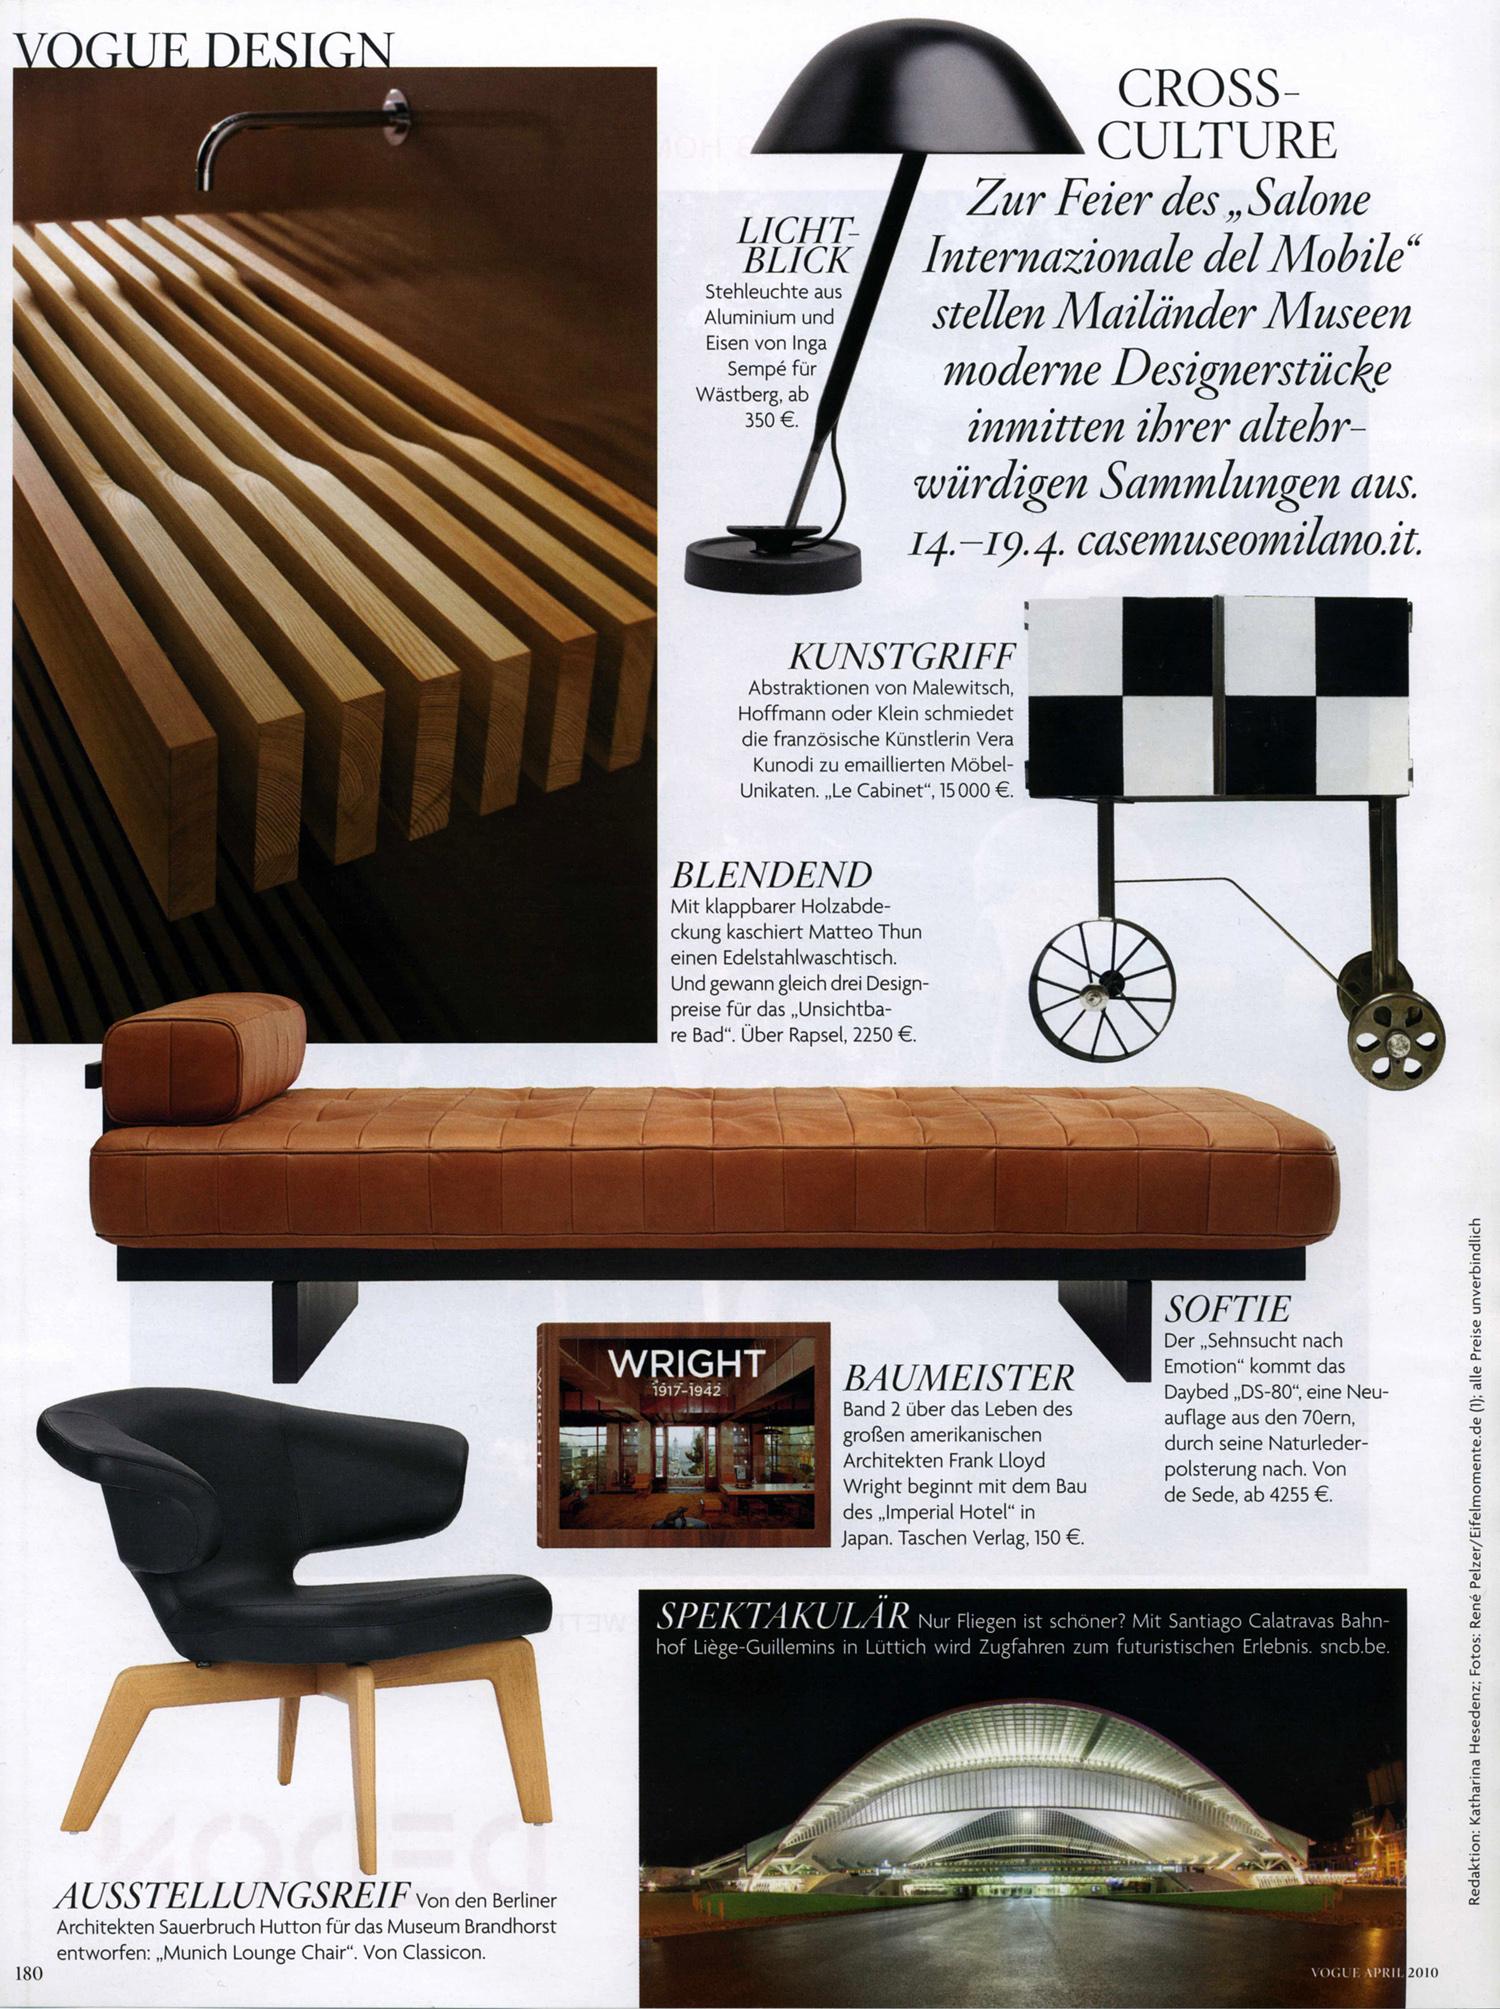 Vogue Design Seite